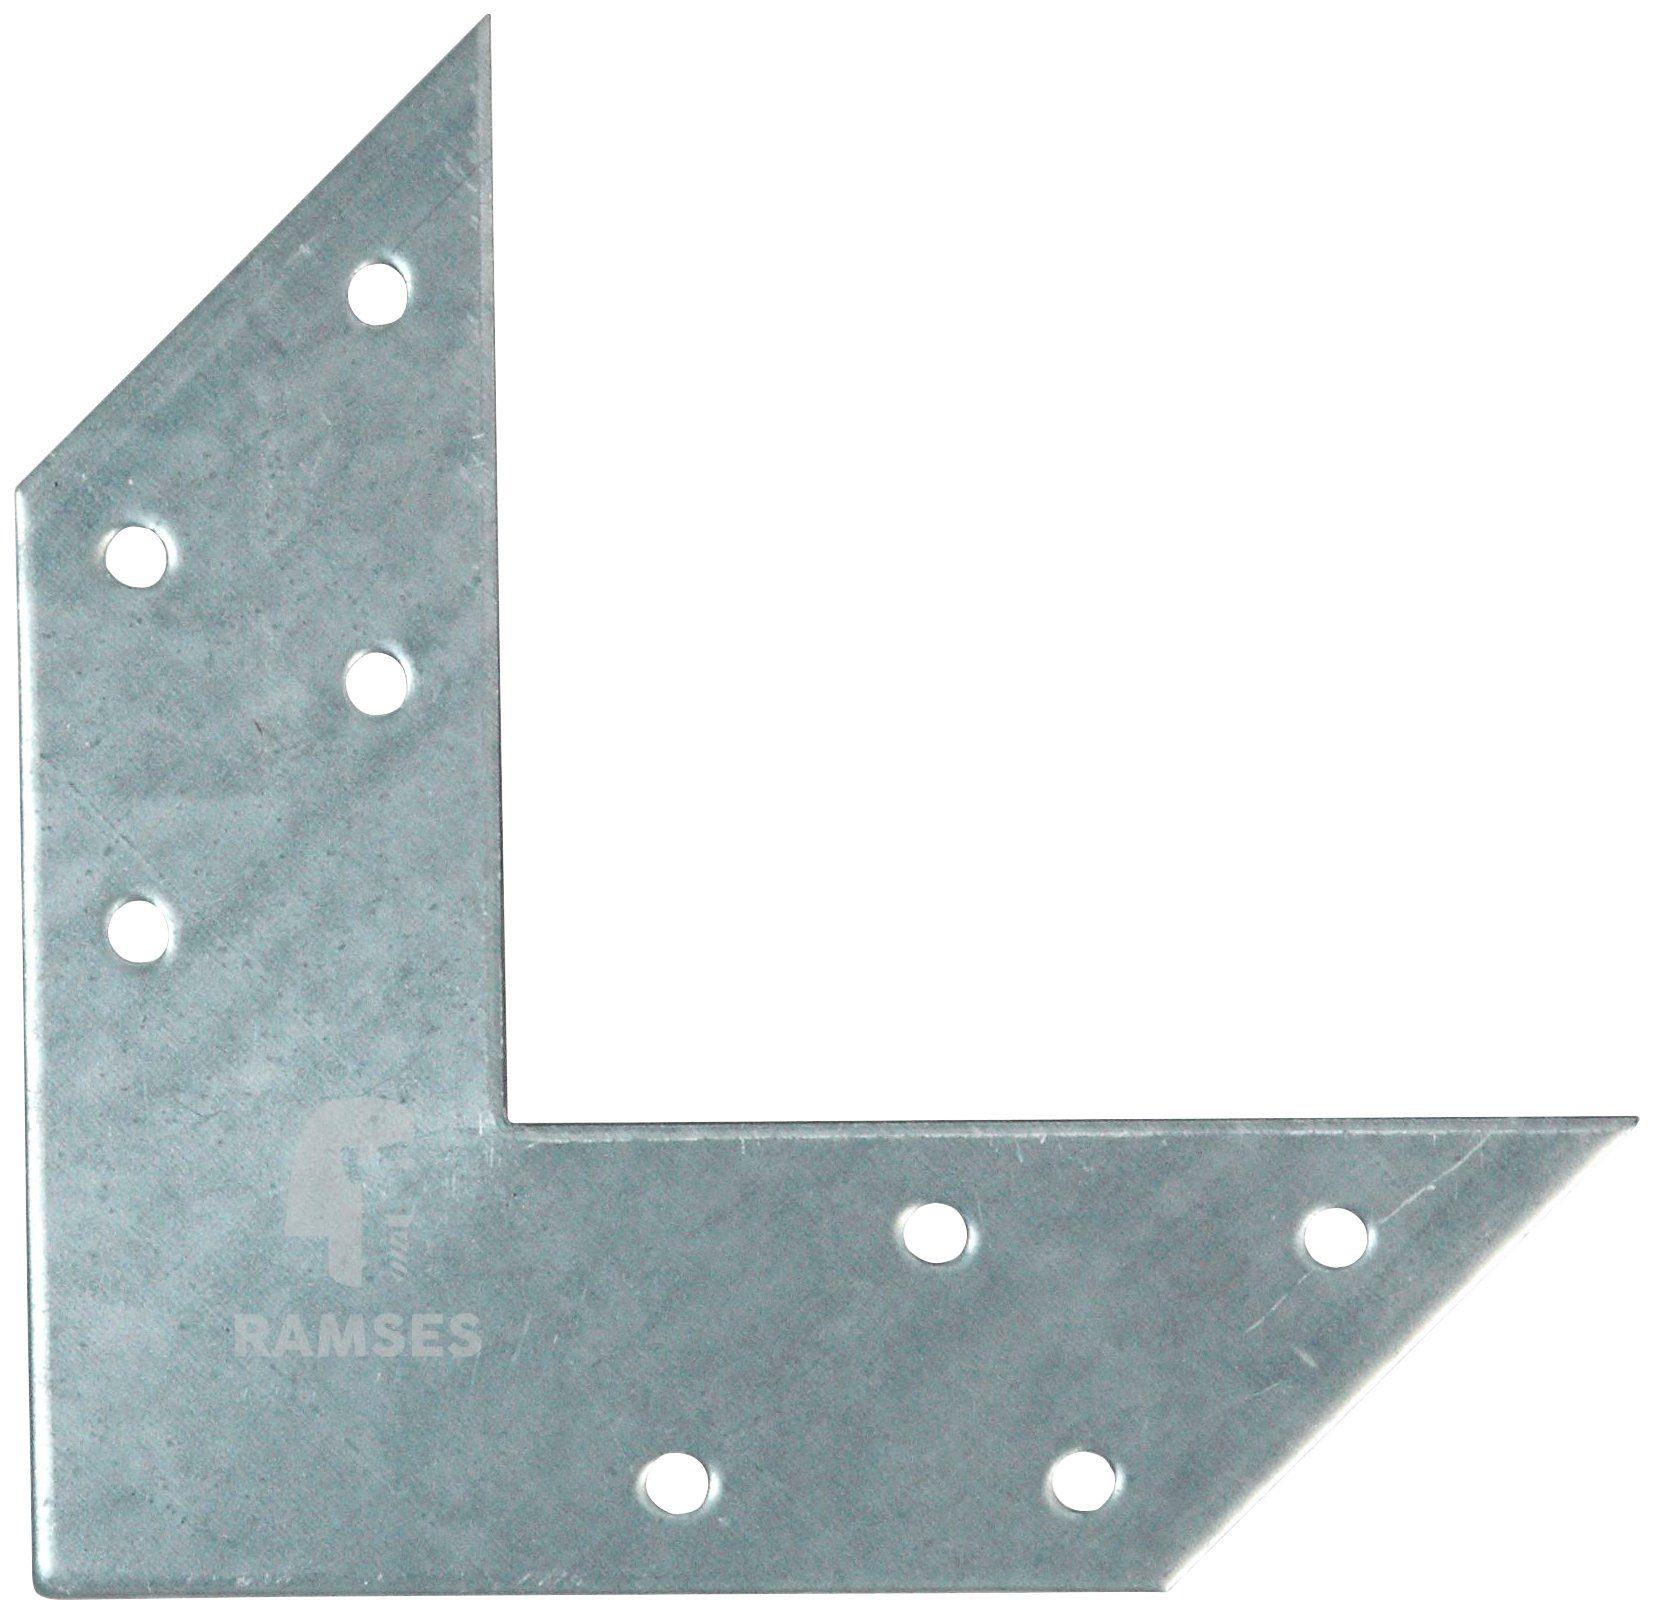 RAMSES Eckwinkel , 170 X 35 X 2 mm Stahl verzinkt 5 Stück